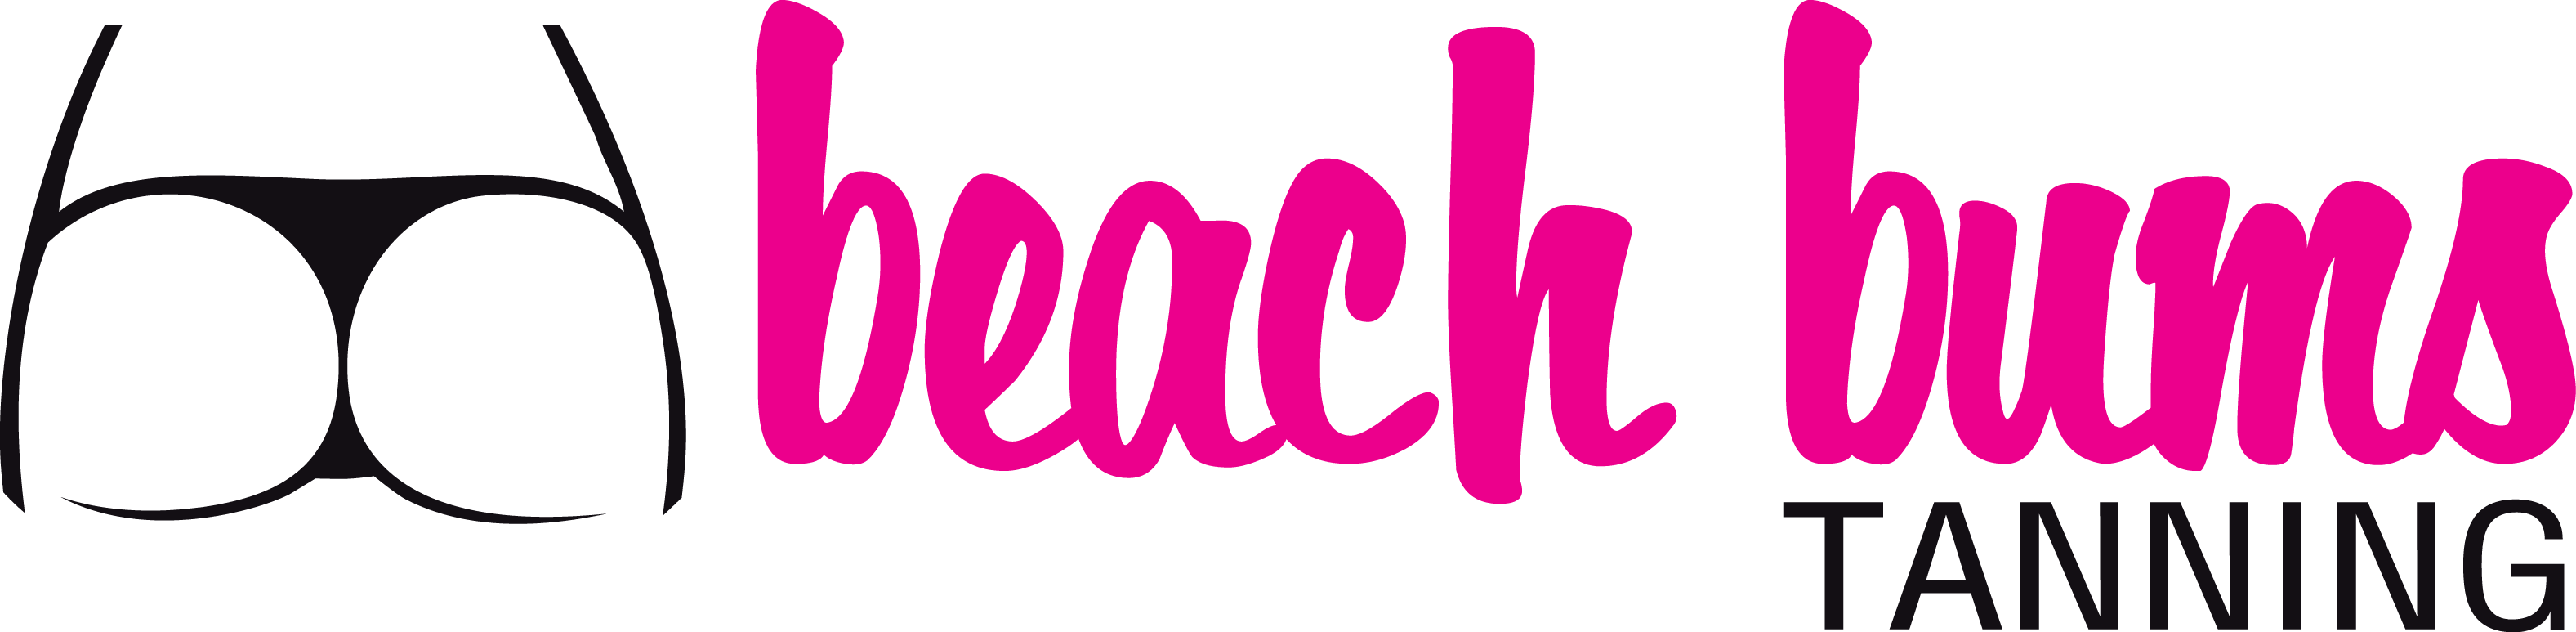 Beach Bums Tanning